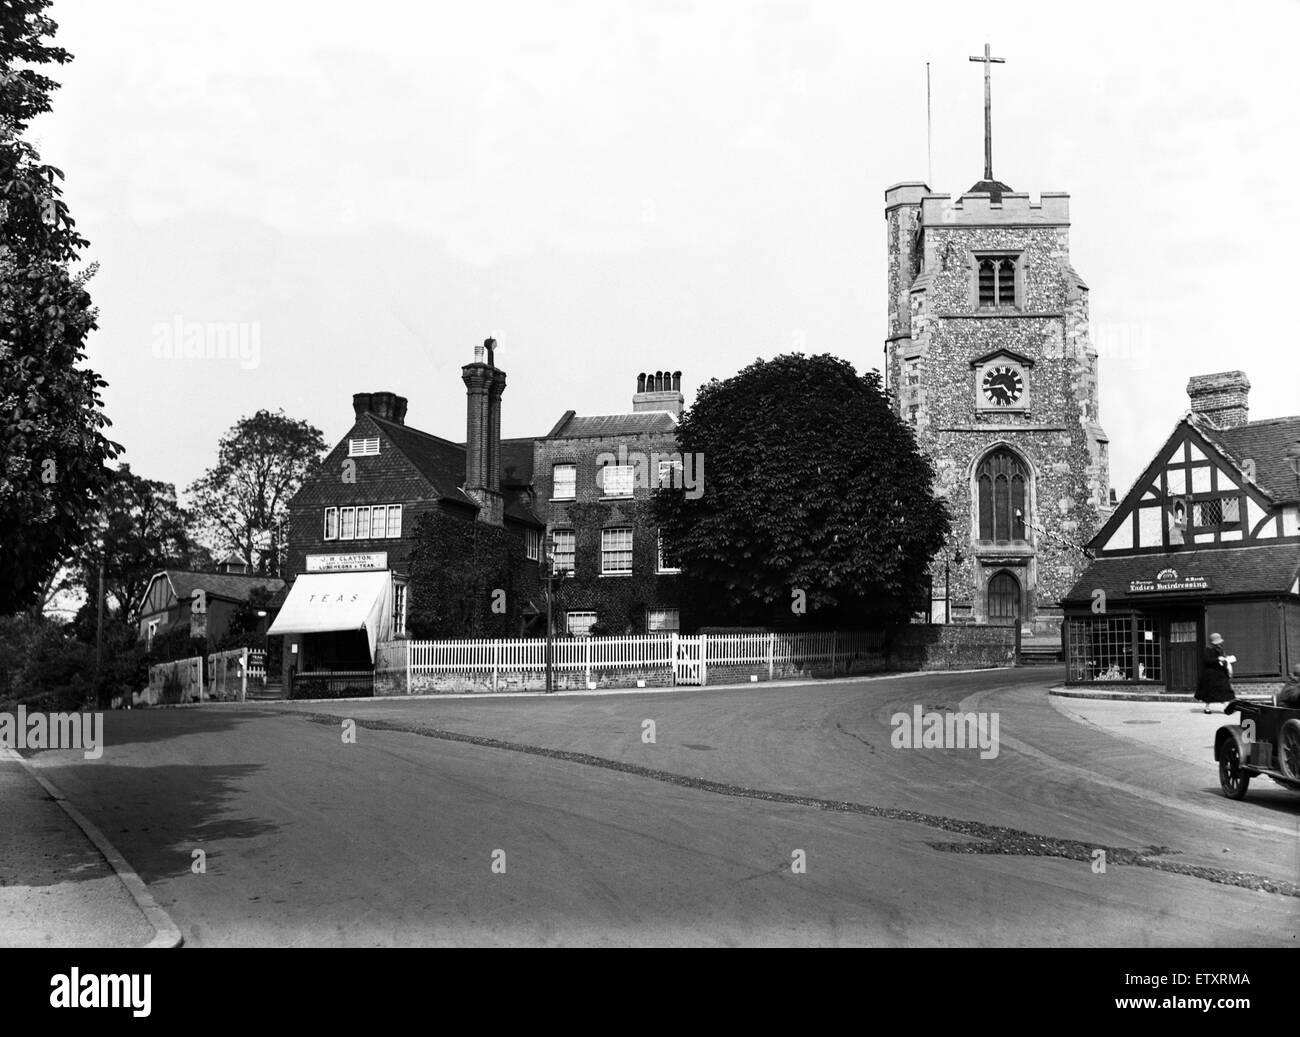 St John the Baptist Church and High Street Pinner, London. Circa 1930 - Stock Image